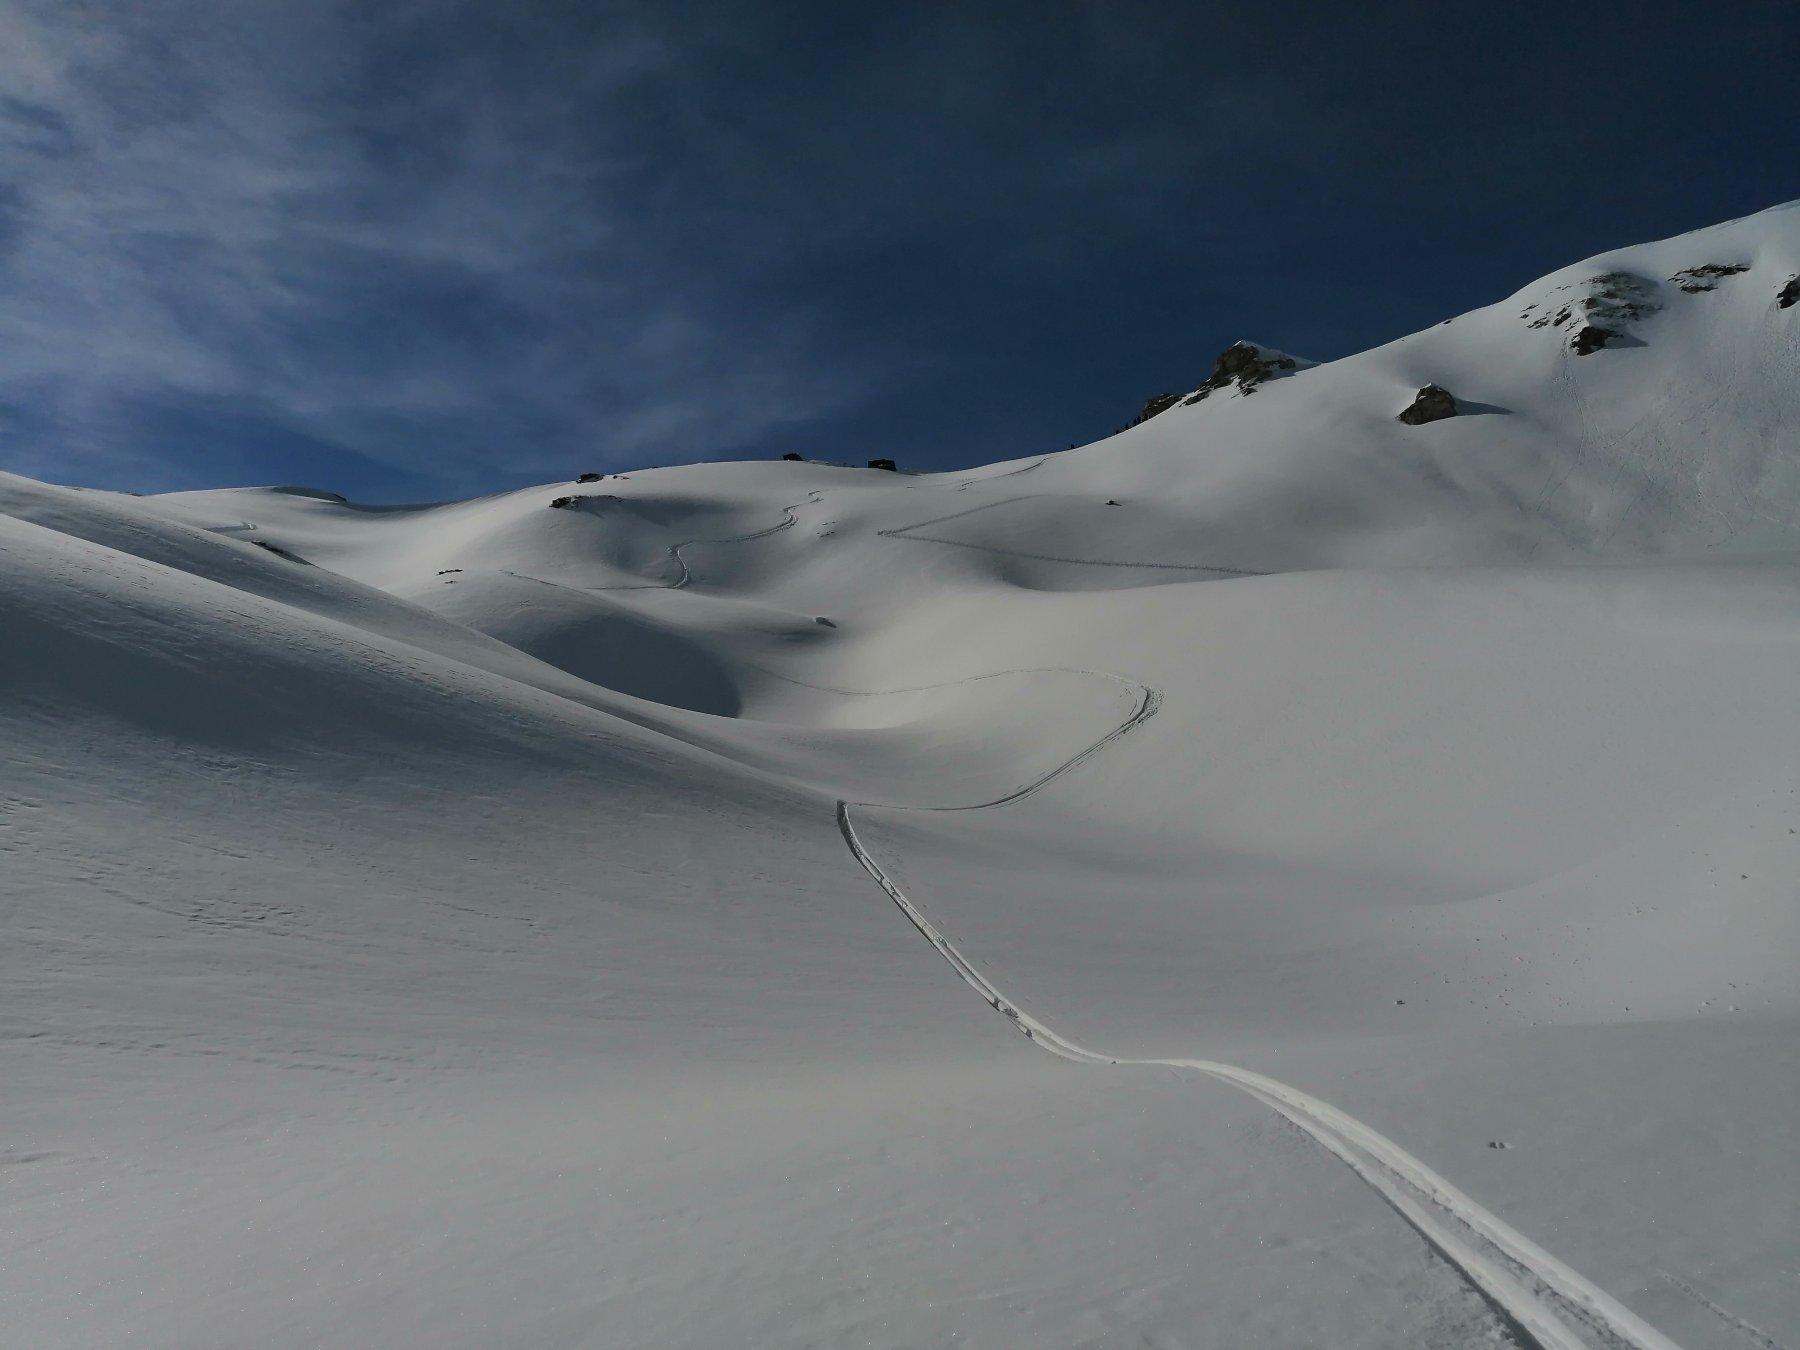 Chaleby (Col) quota 2695 m da Lignan 2020-02-15